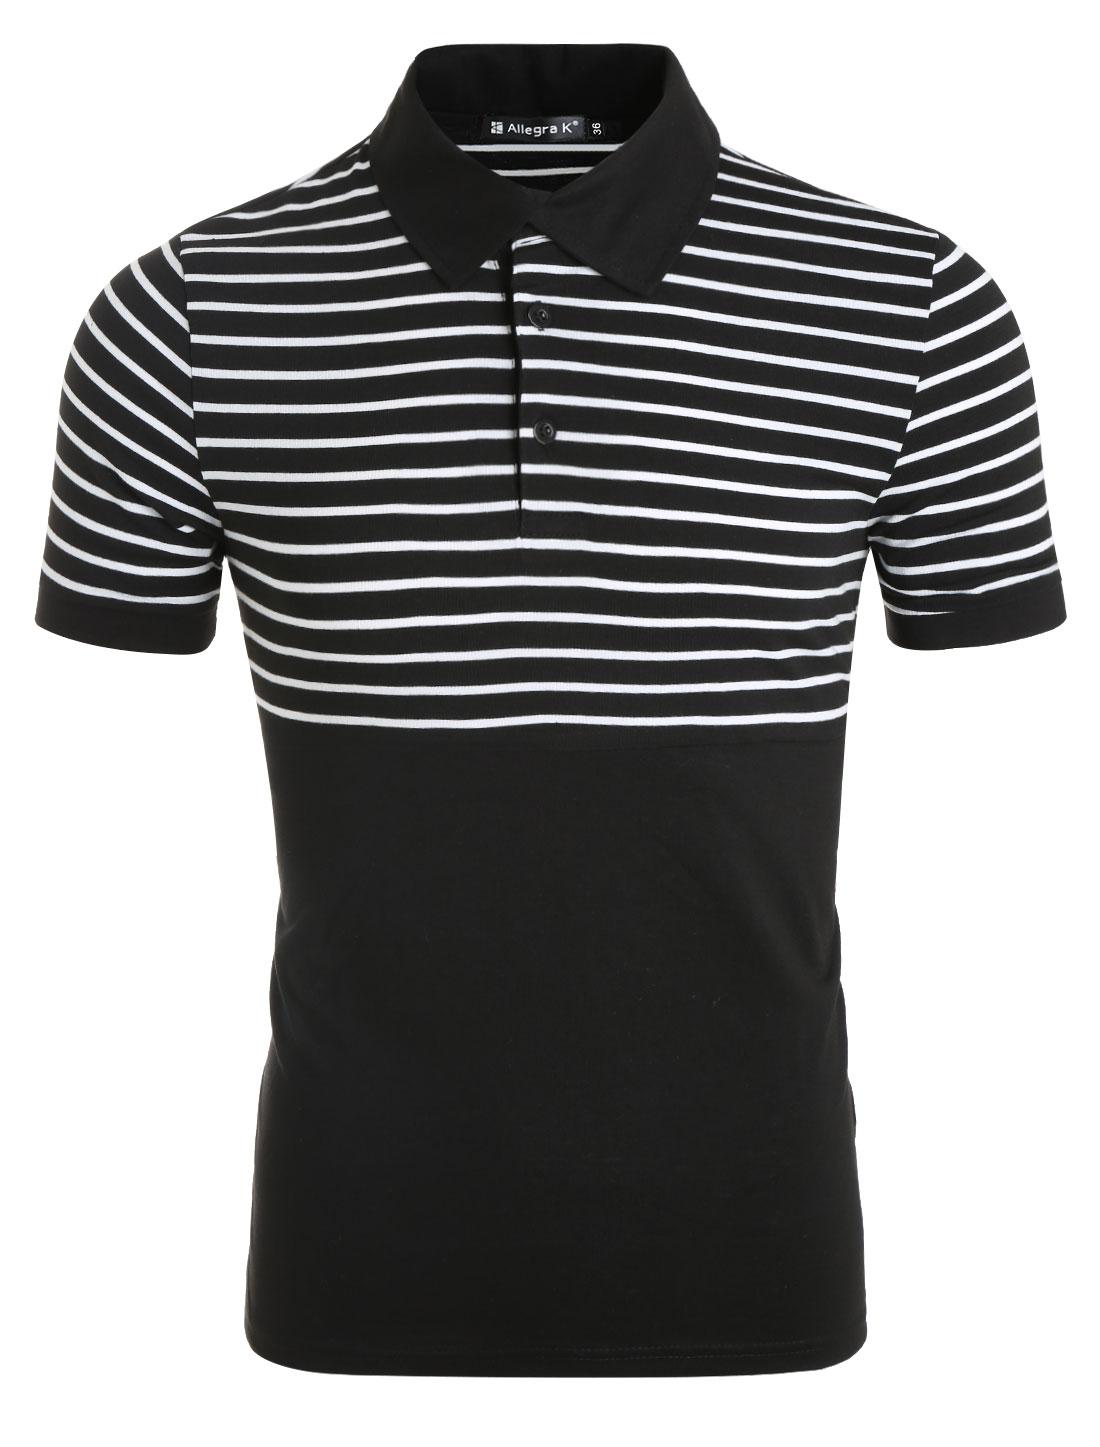 Men Striped Point Collar Short Sleeves Polo Shirt Black M